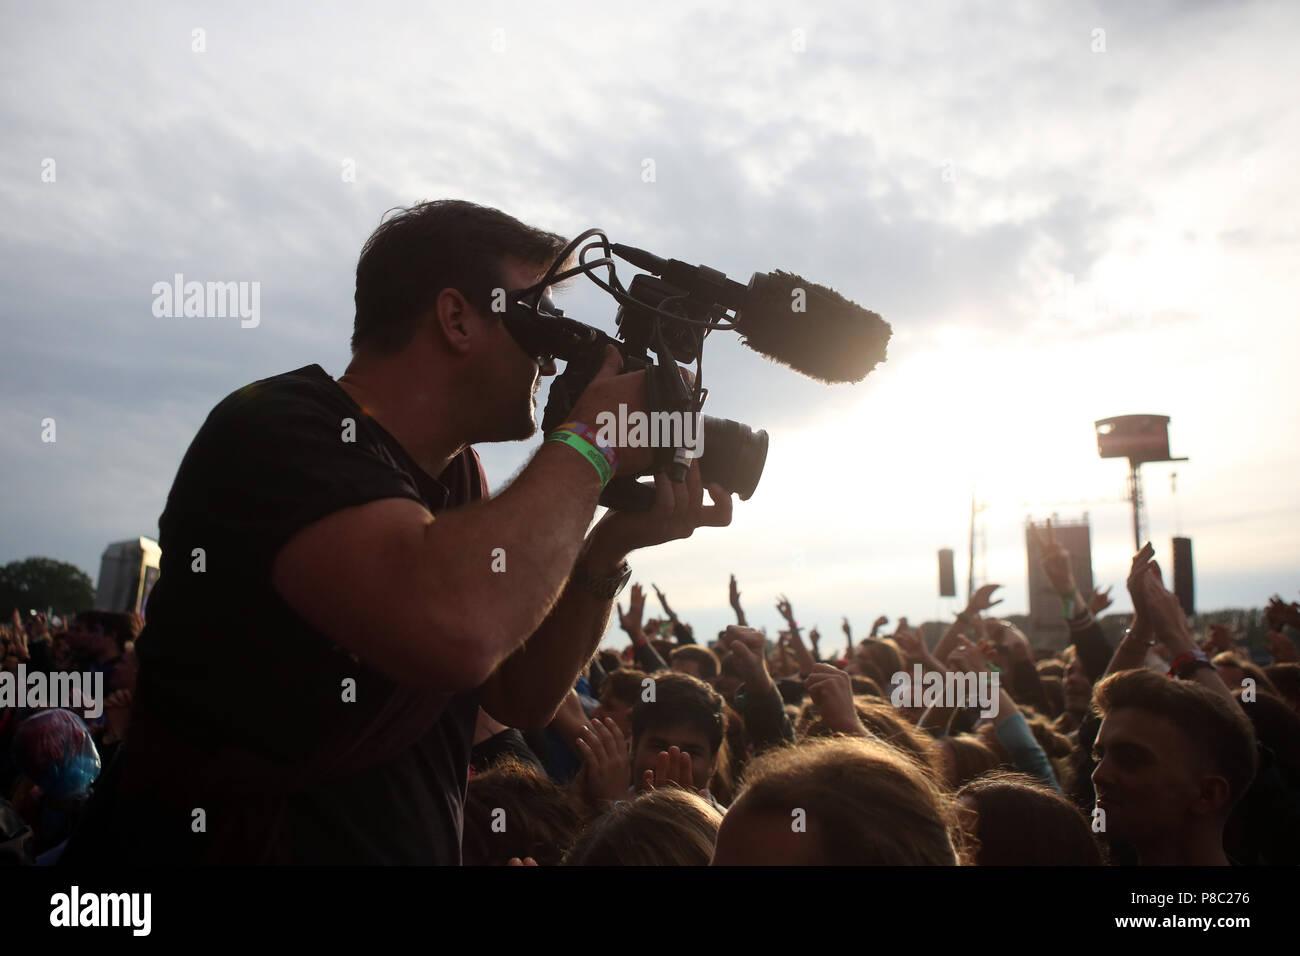 Hoppegarten, Germany, cameraman films a cheering crowd at Lollapalooza Berlin 2017 at the Hoppegarten racecourse Stock Photo